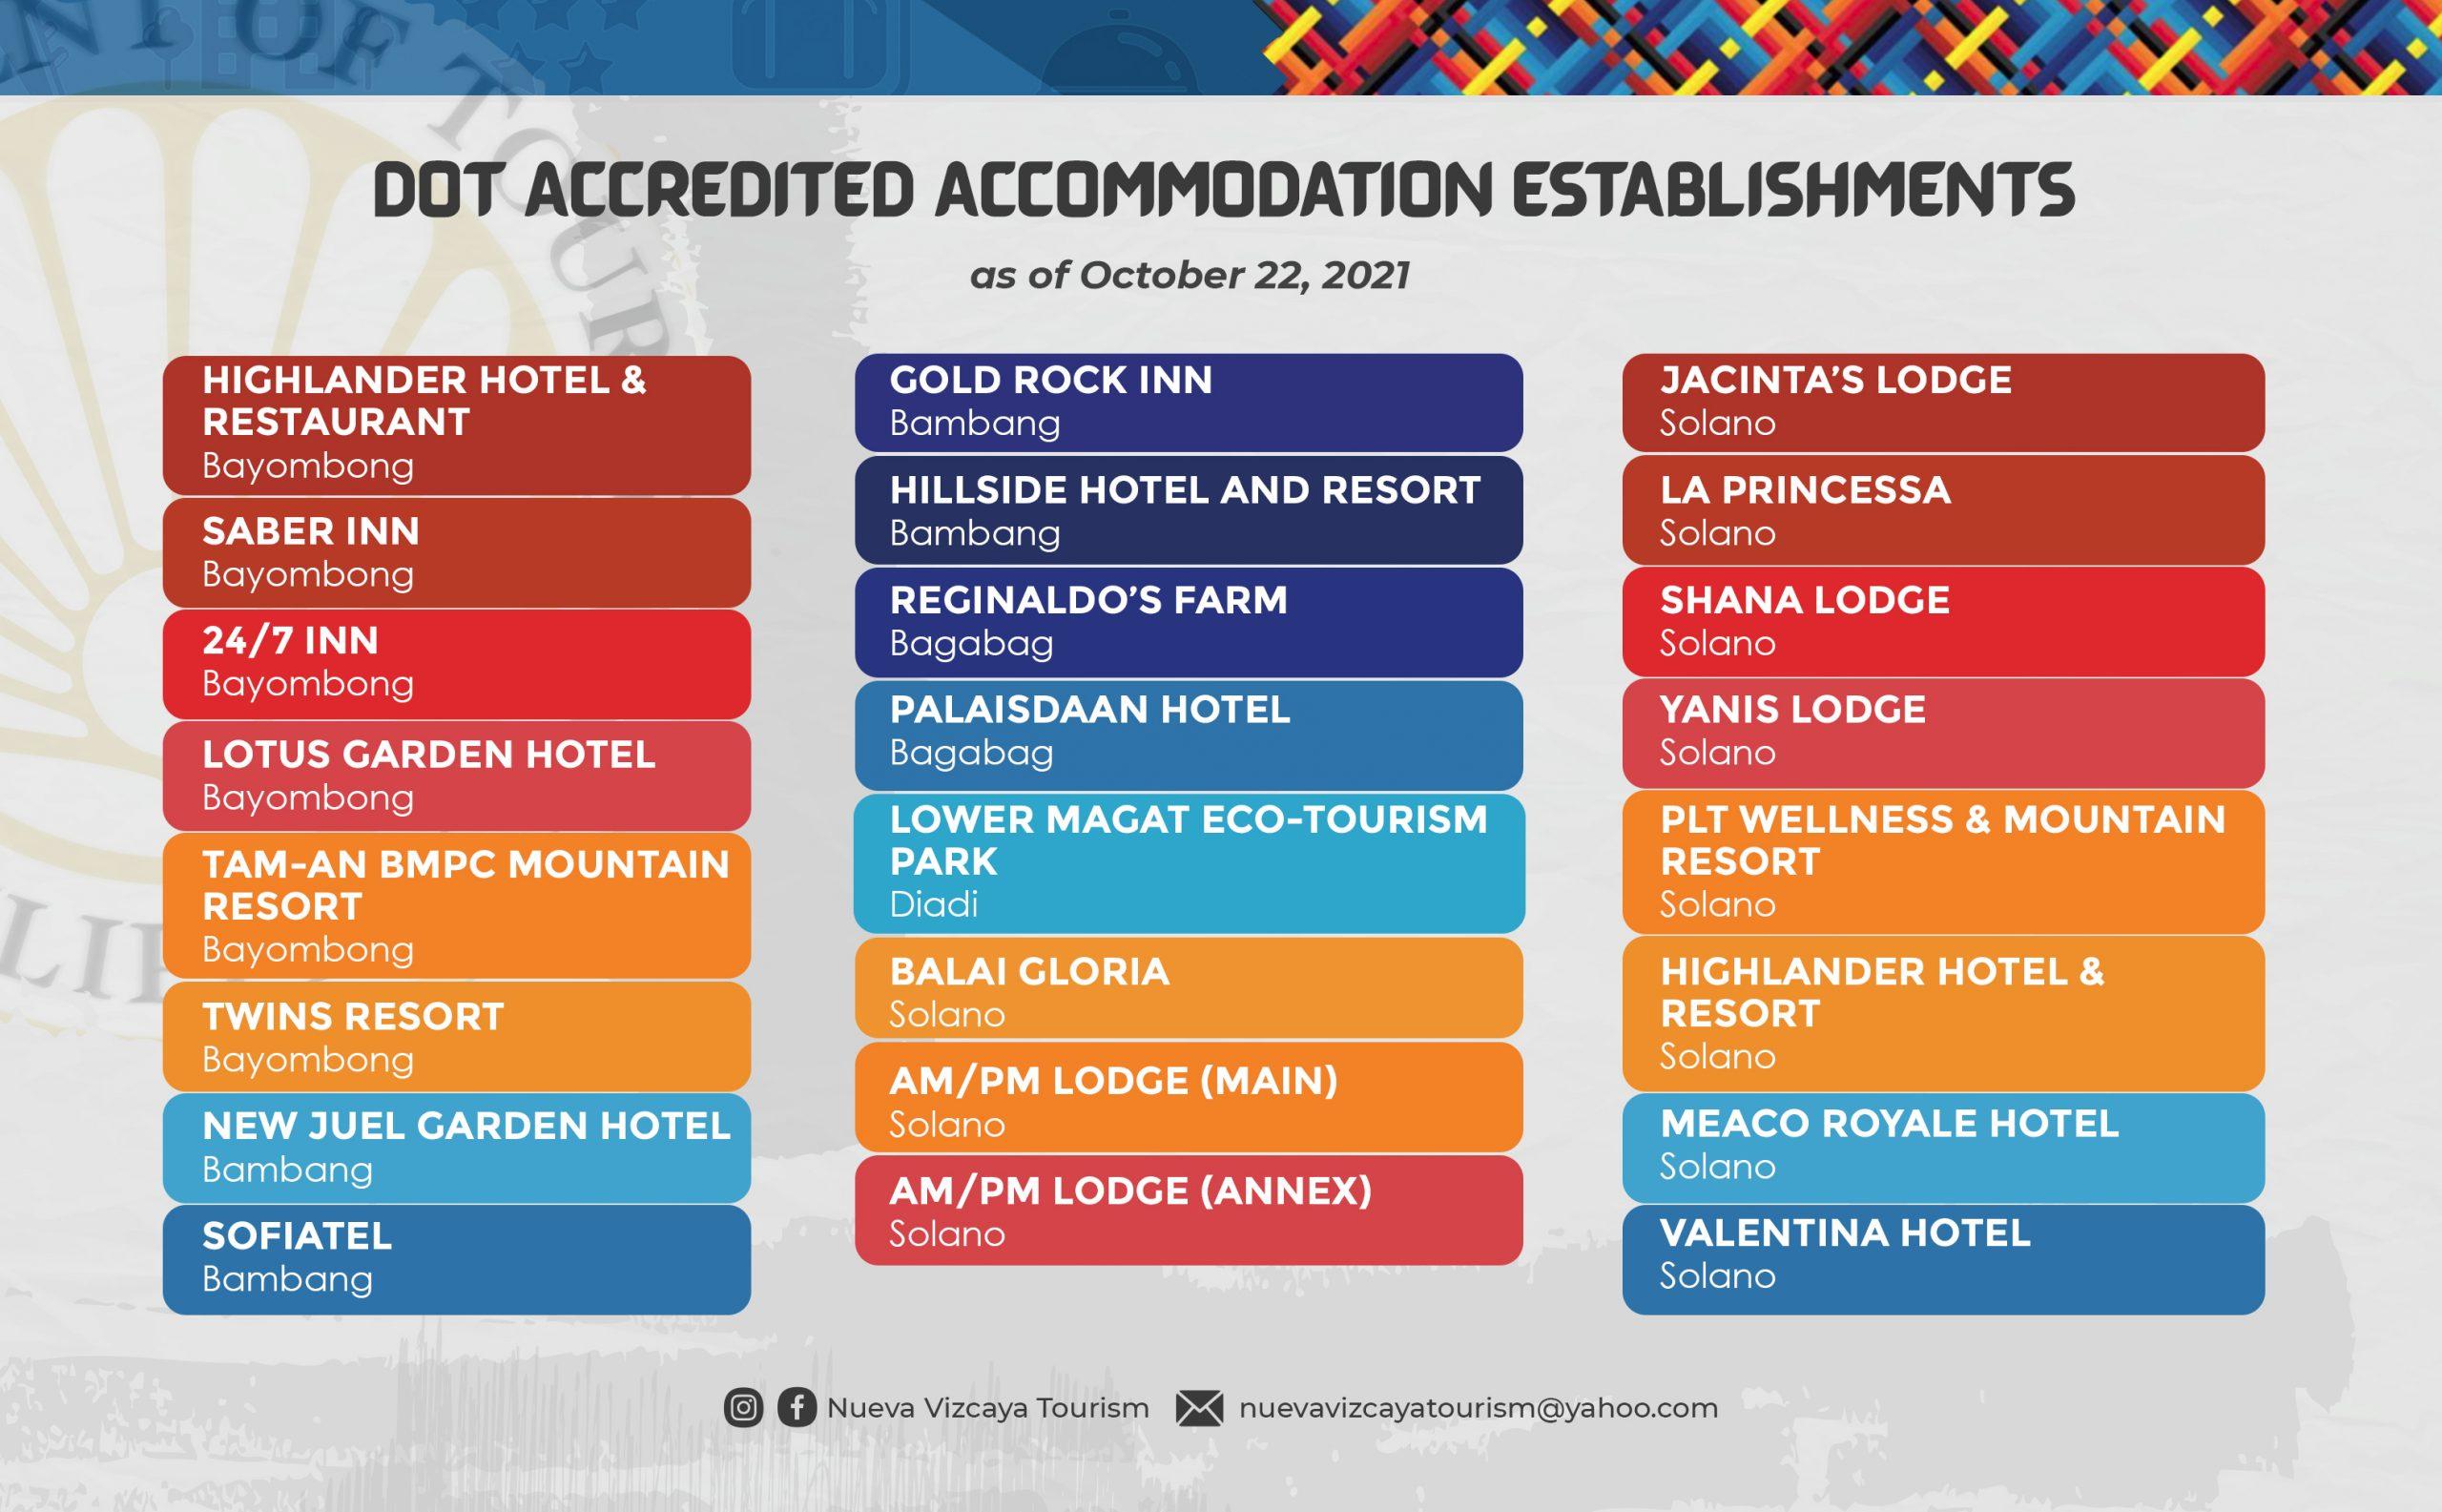 DOT Accredited Accommodation Establishments